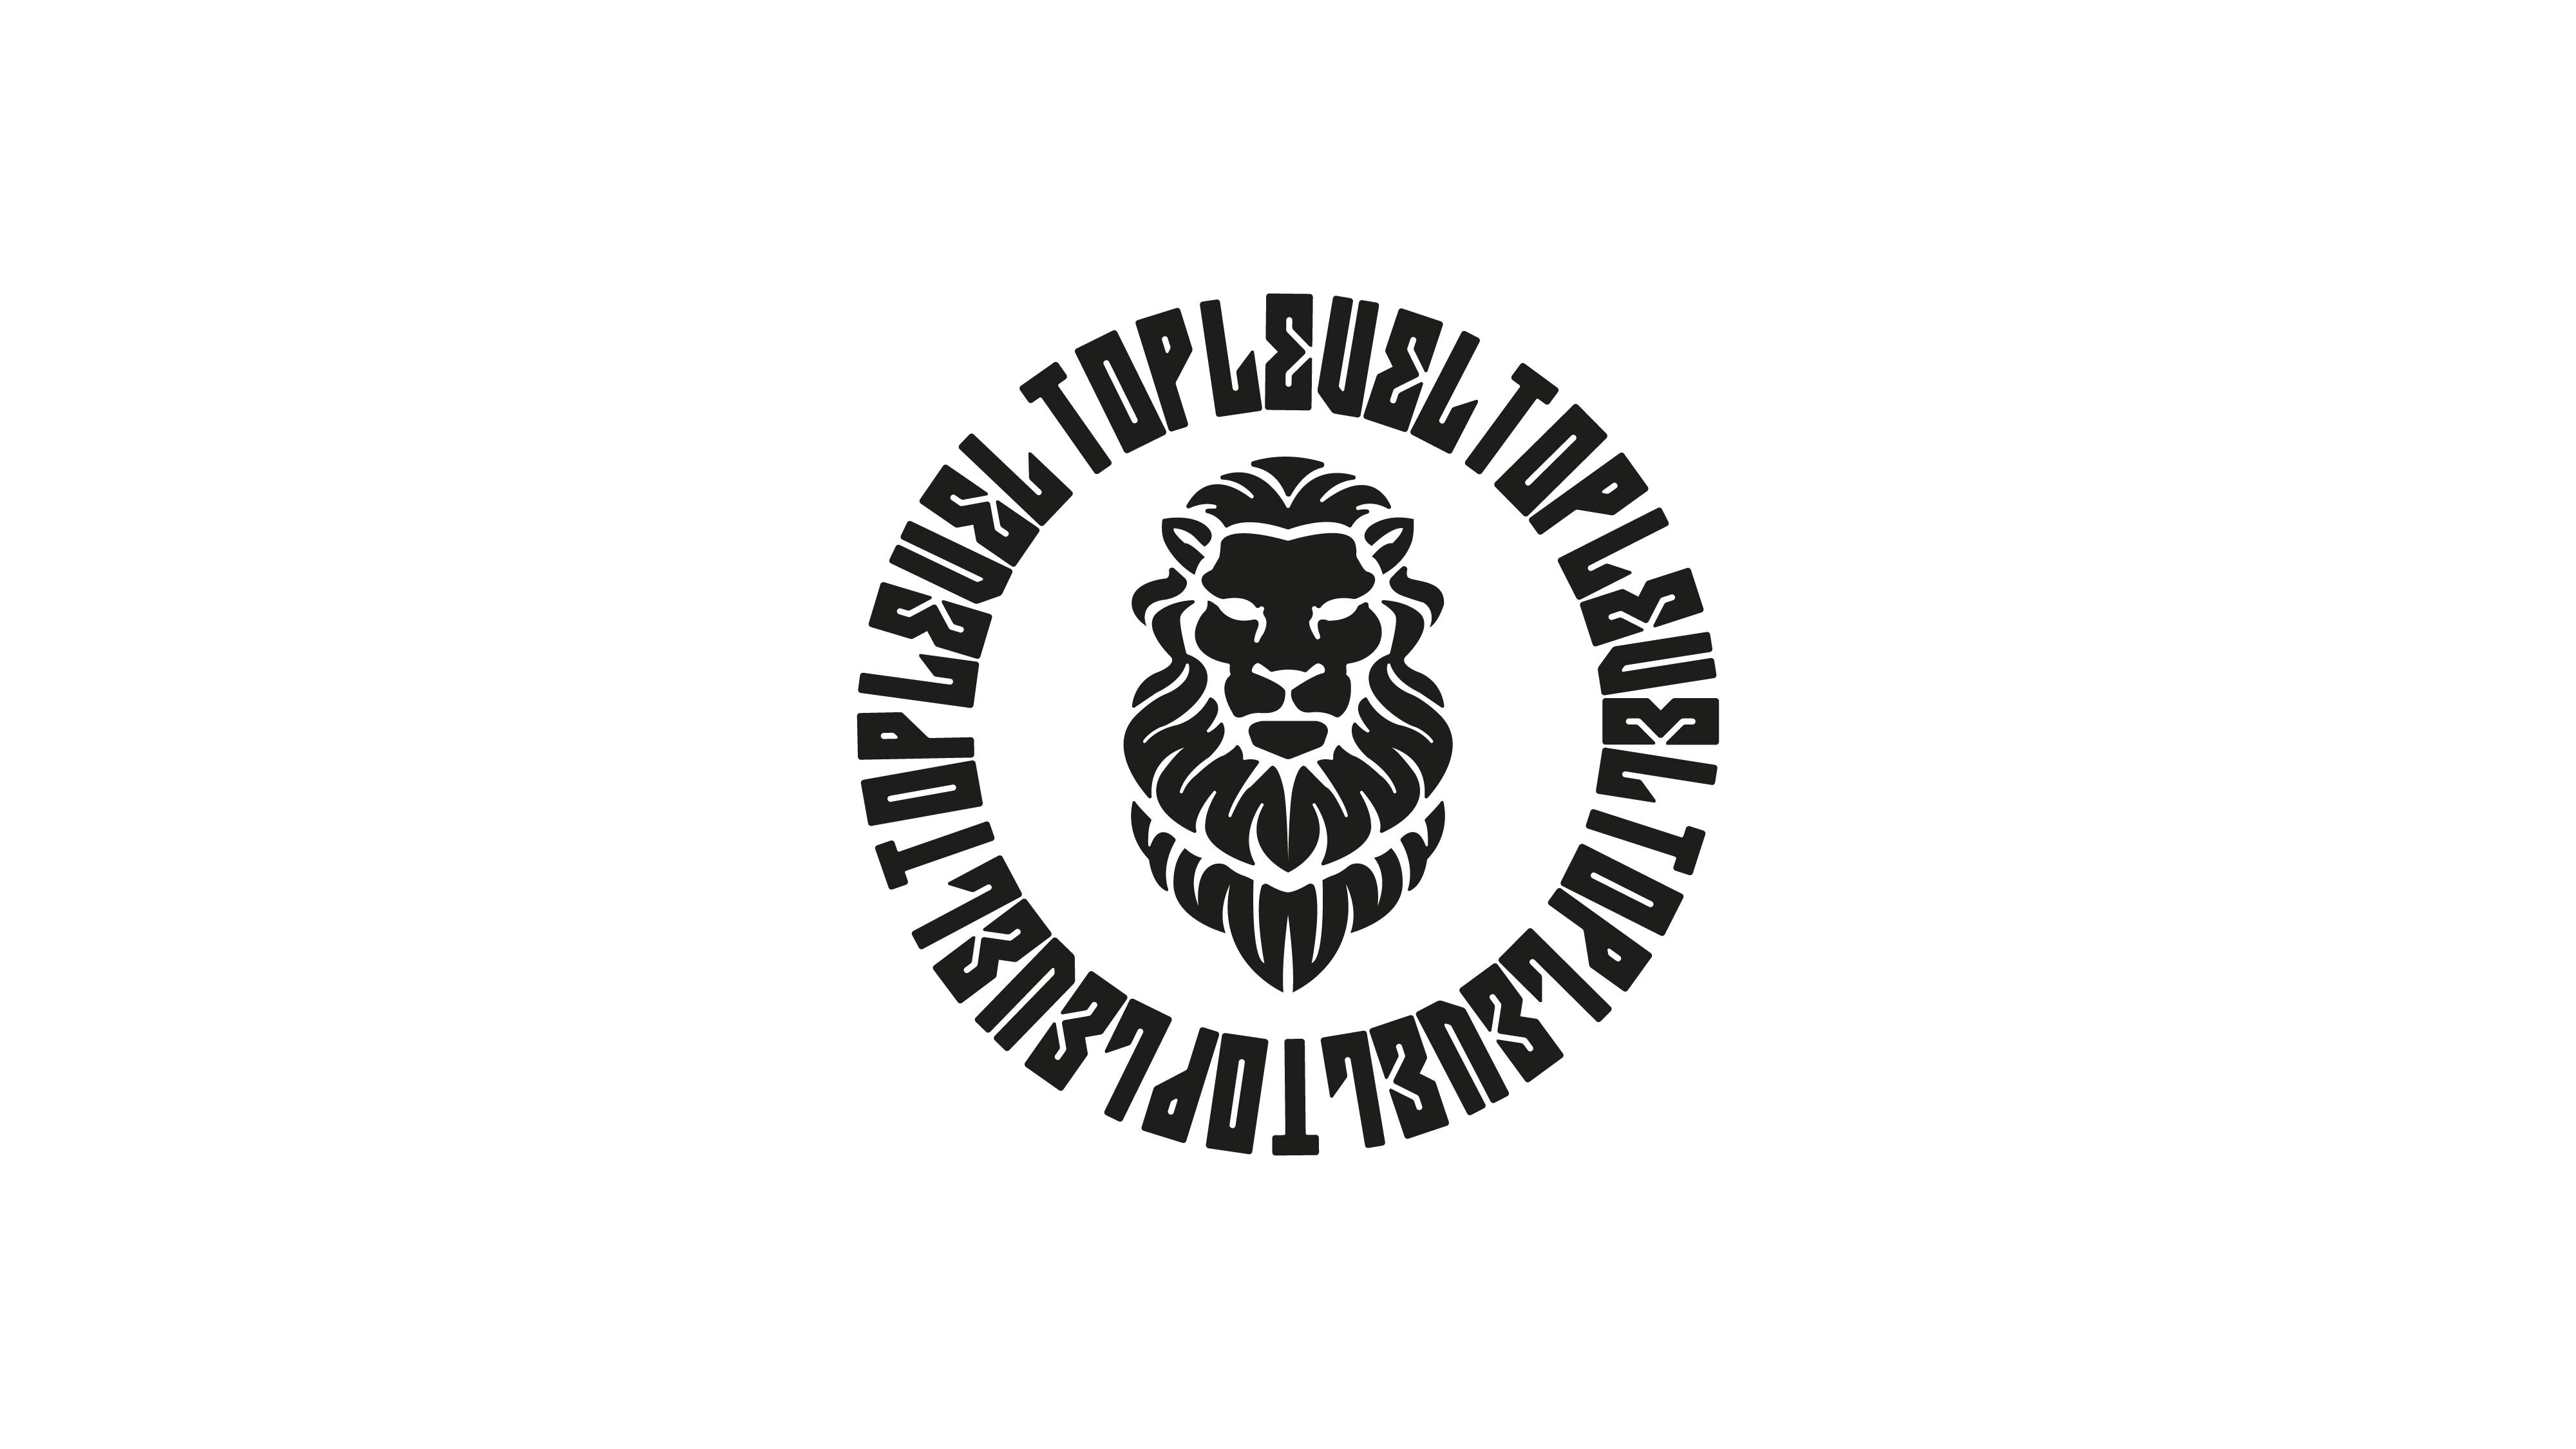 Разработка логотипа для тюнинг ателье фото f_3035f313a393df9e.jpg